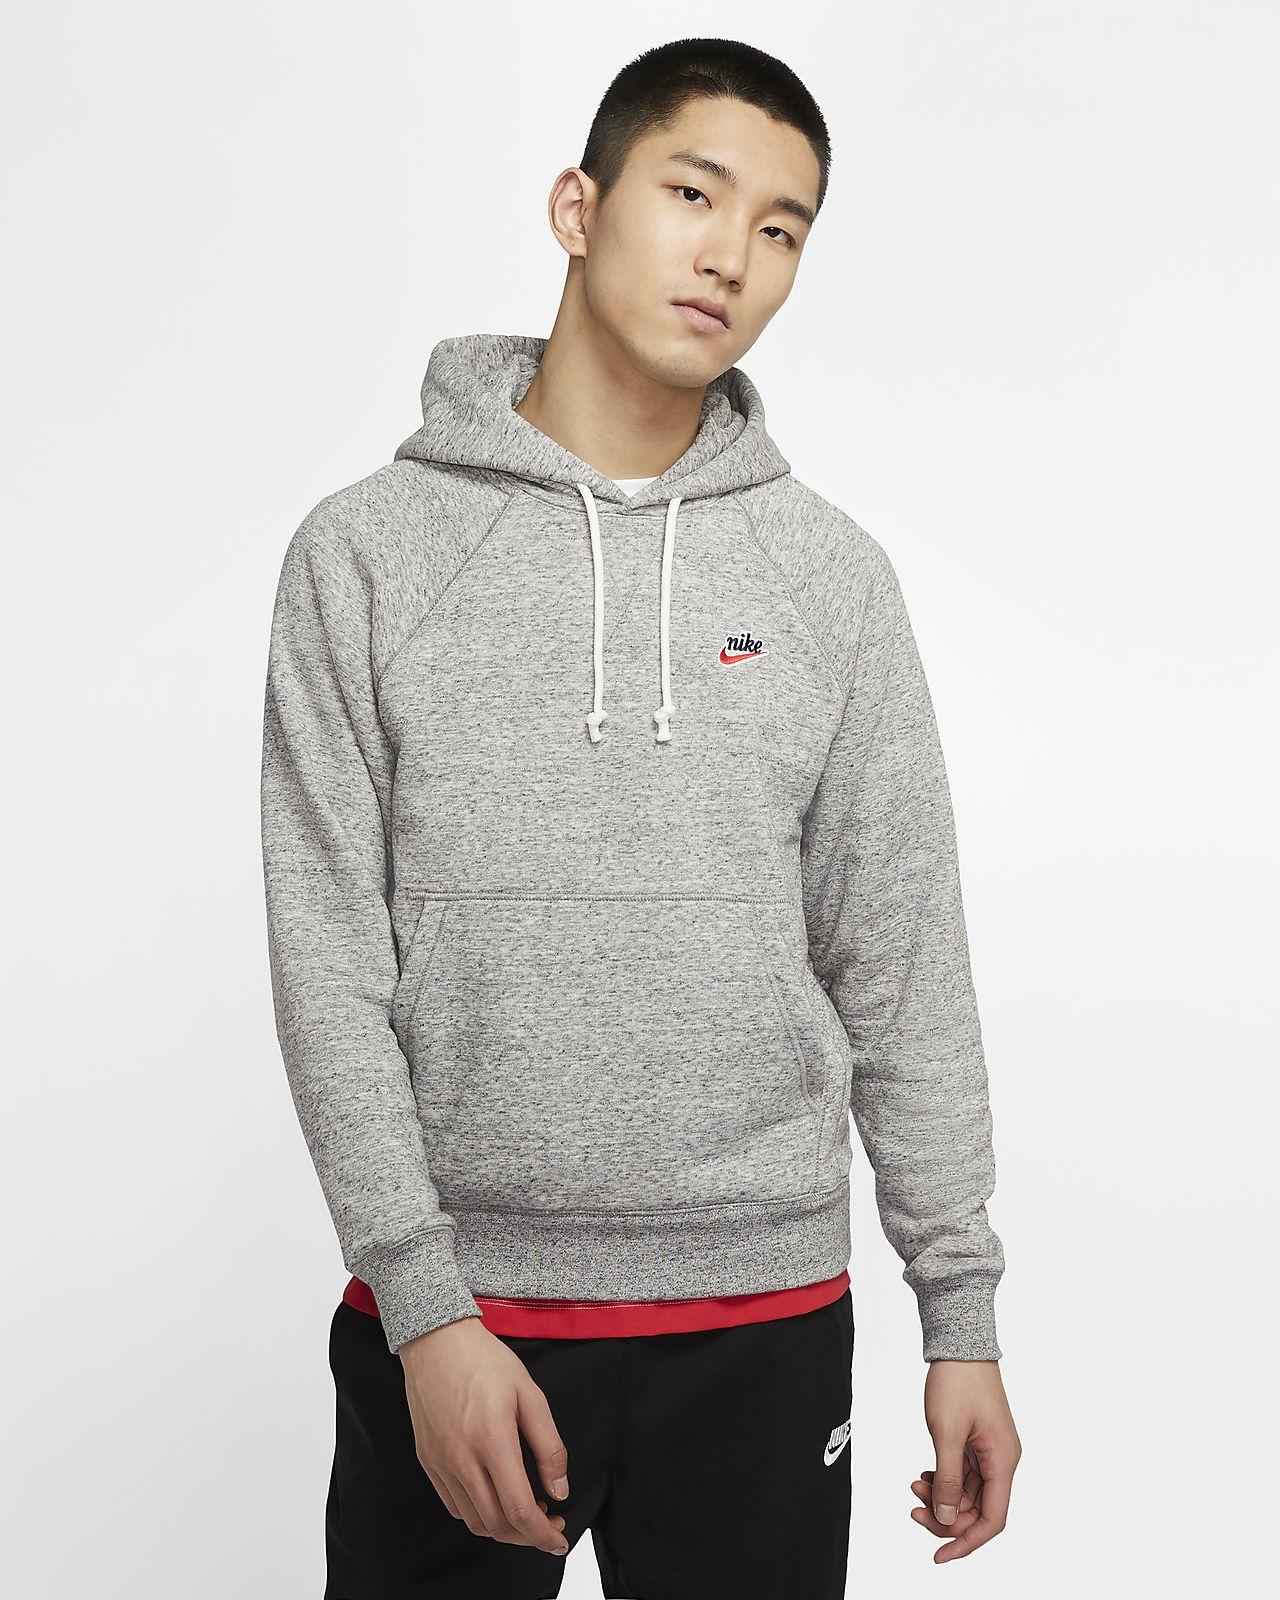 Nike Sportswear Heritage 男子套头连帽衫